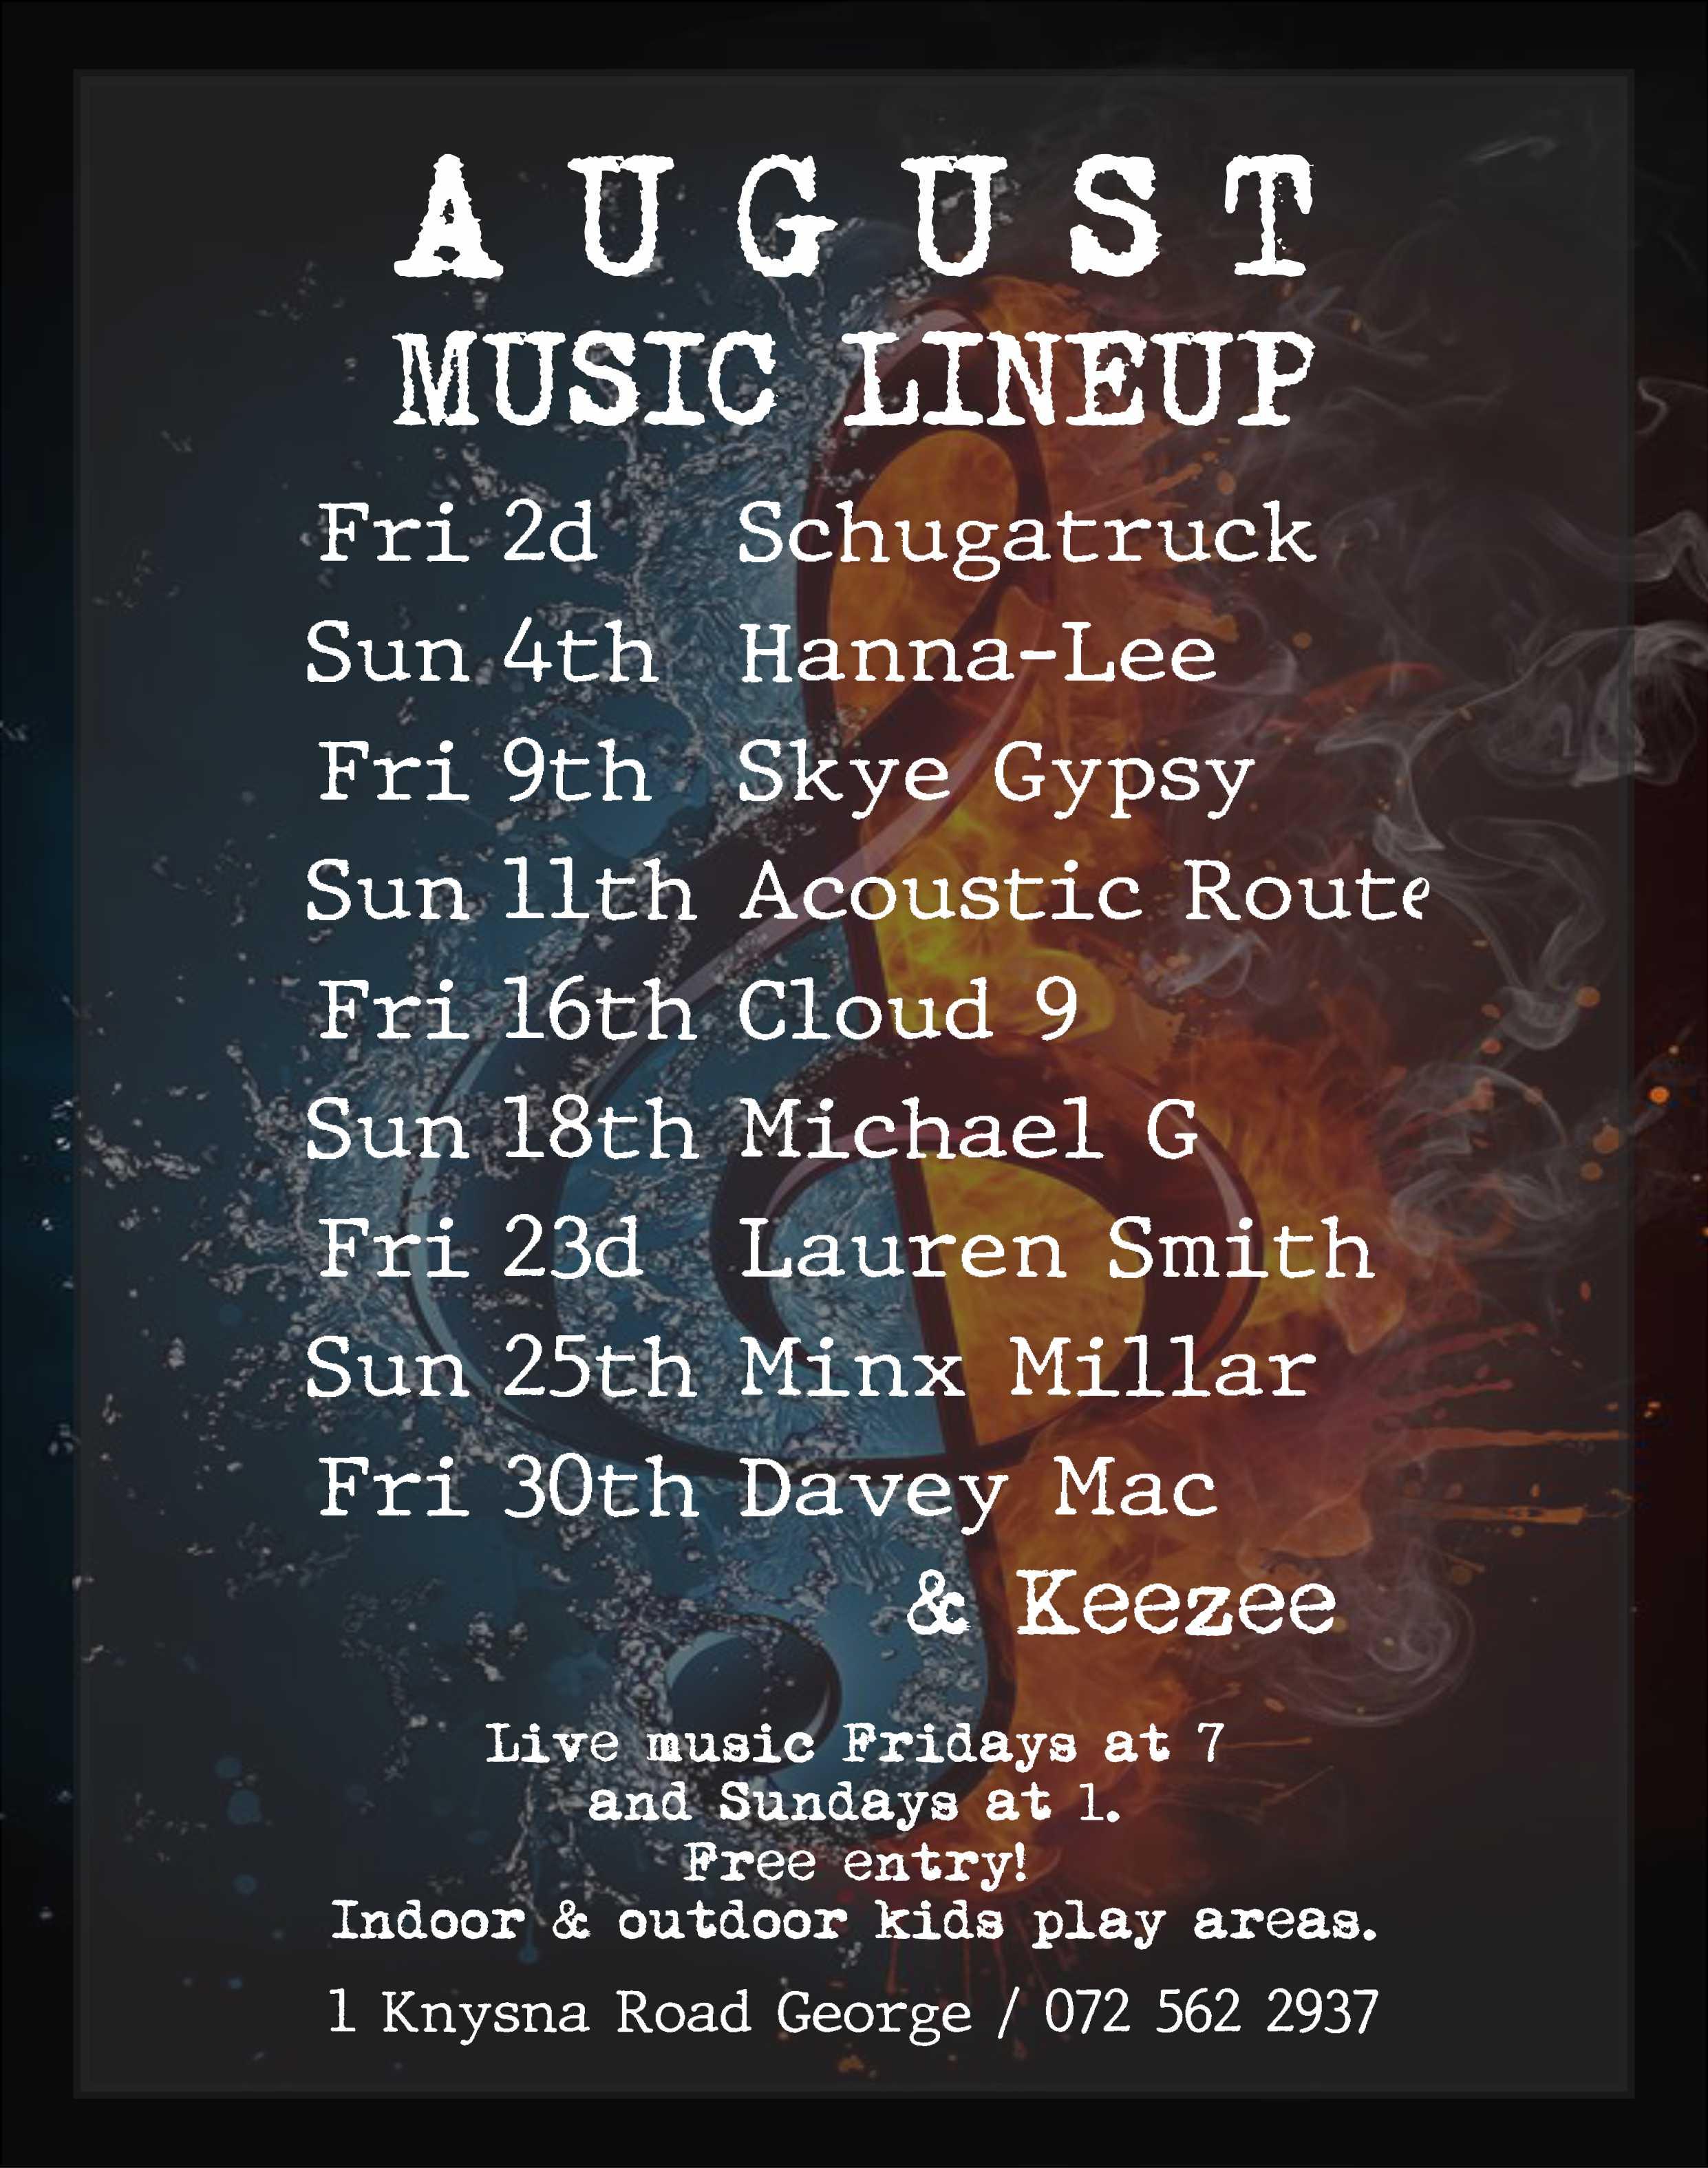 Lineup - August 2019 Social media